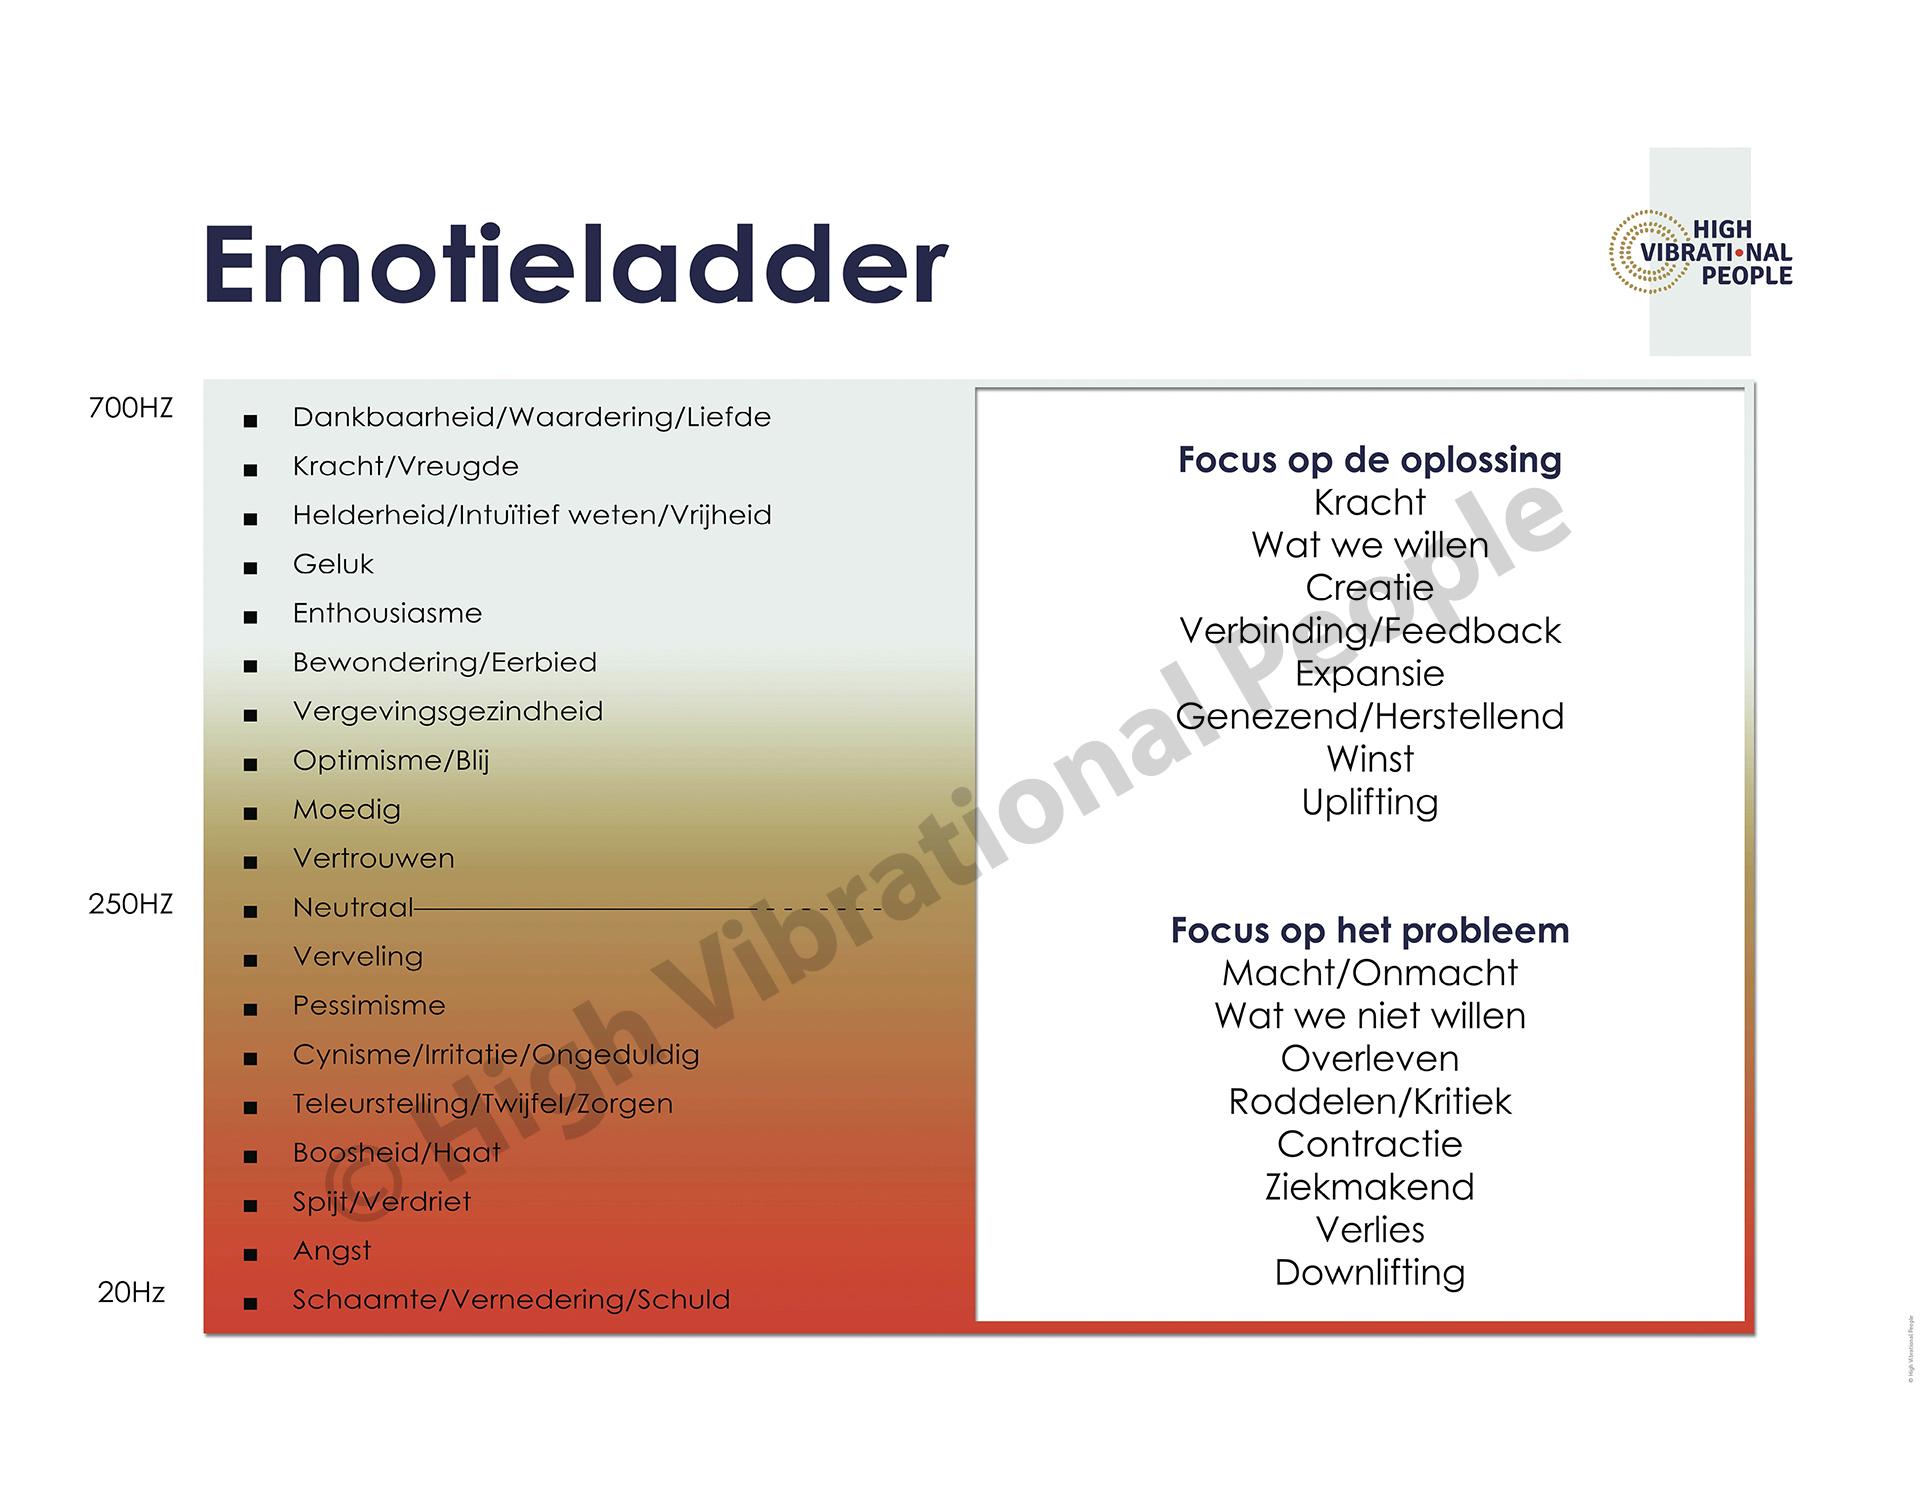 Poster Emotieladder 90×134 Cm